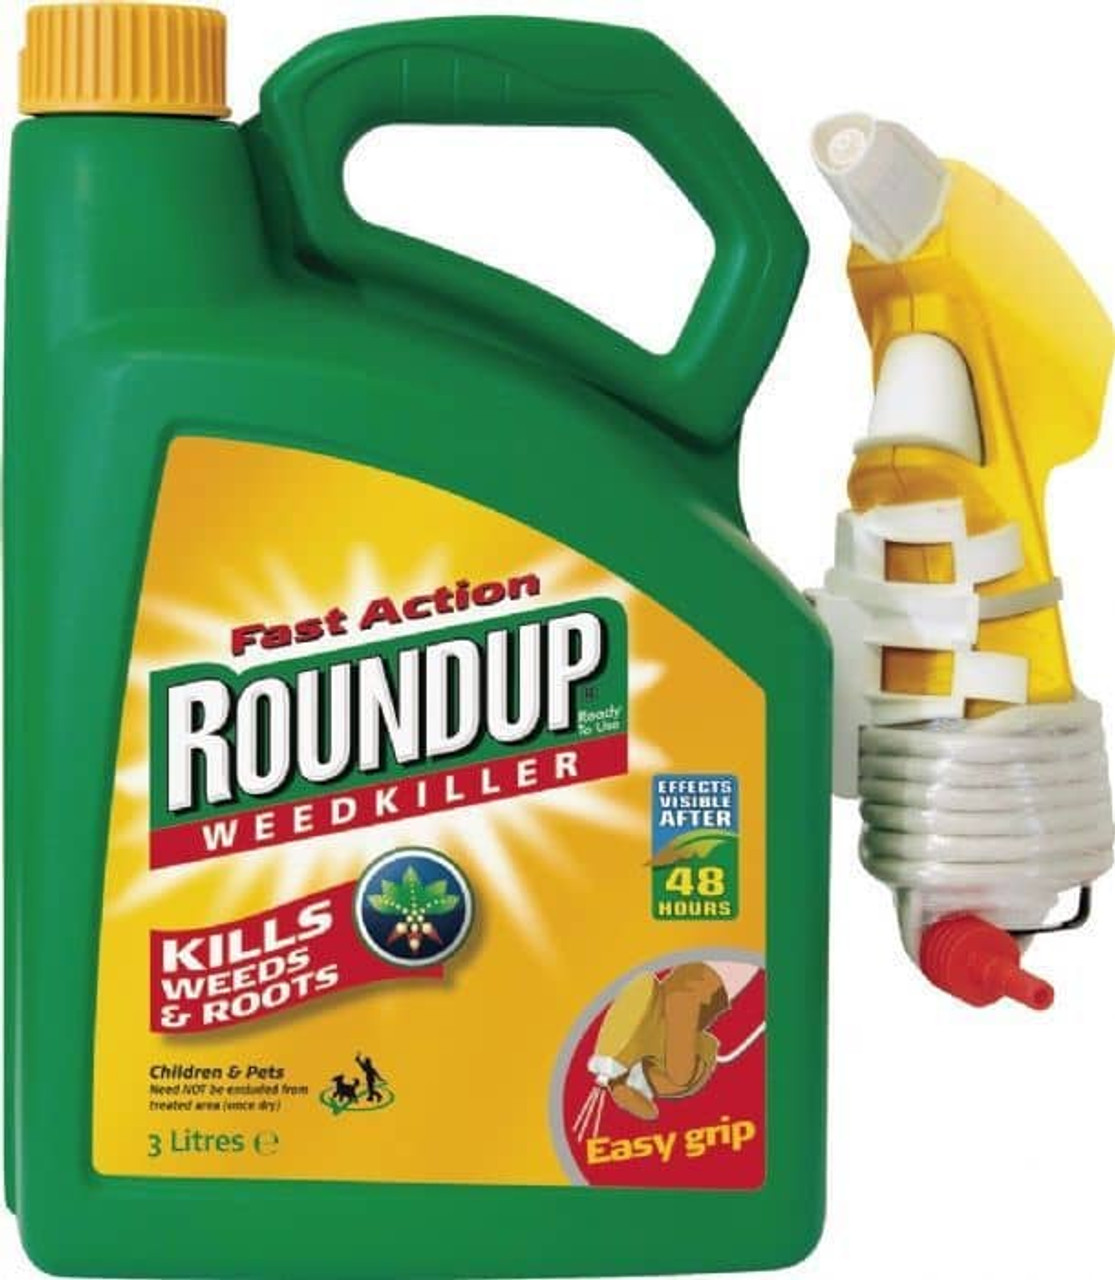 Roundup 3ltr Weedkiller